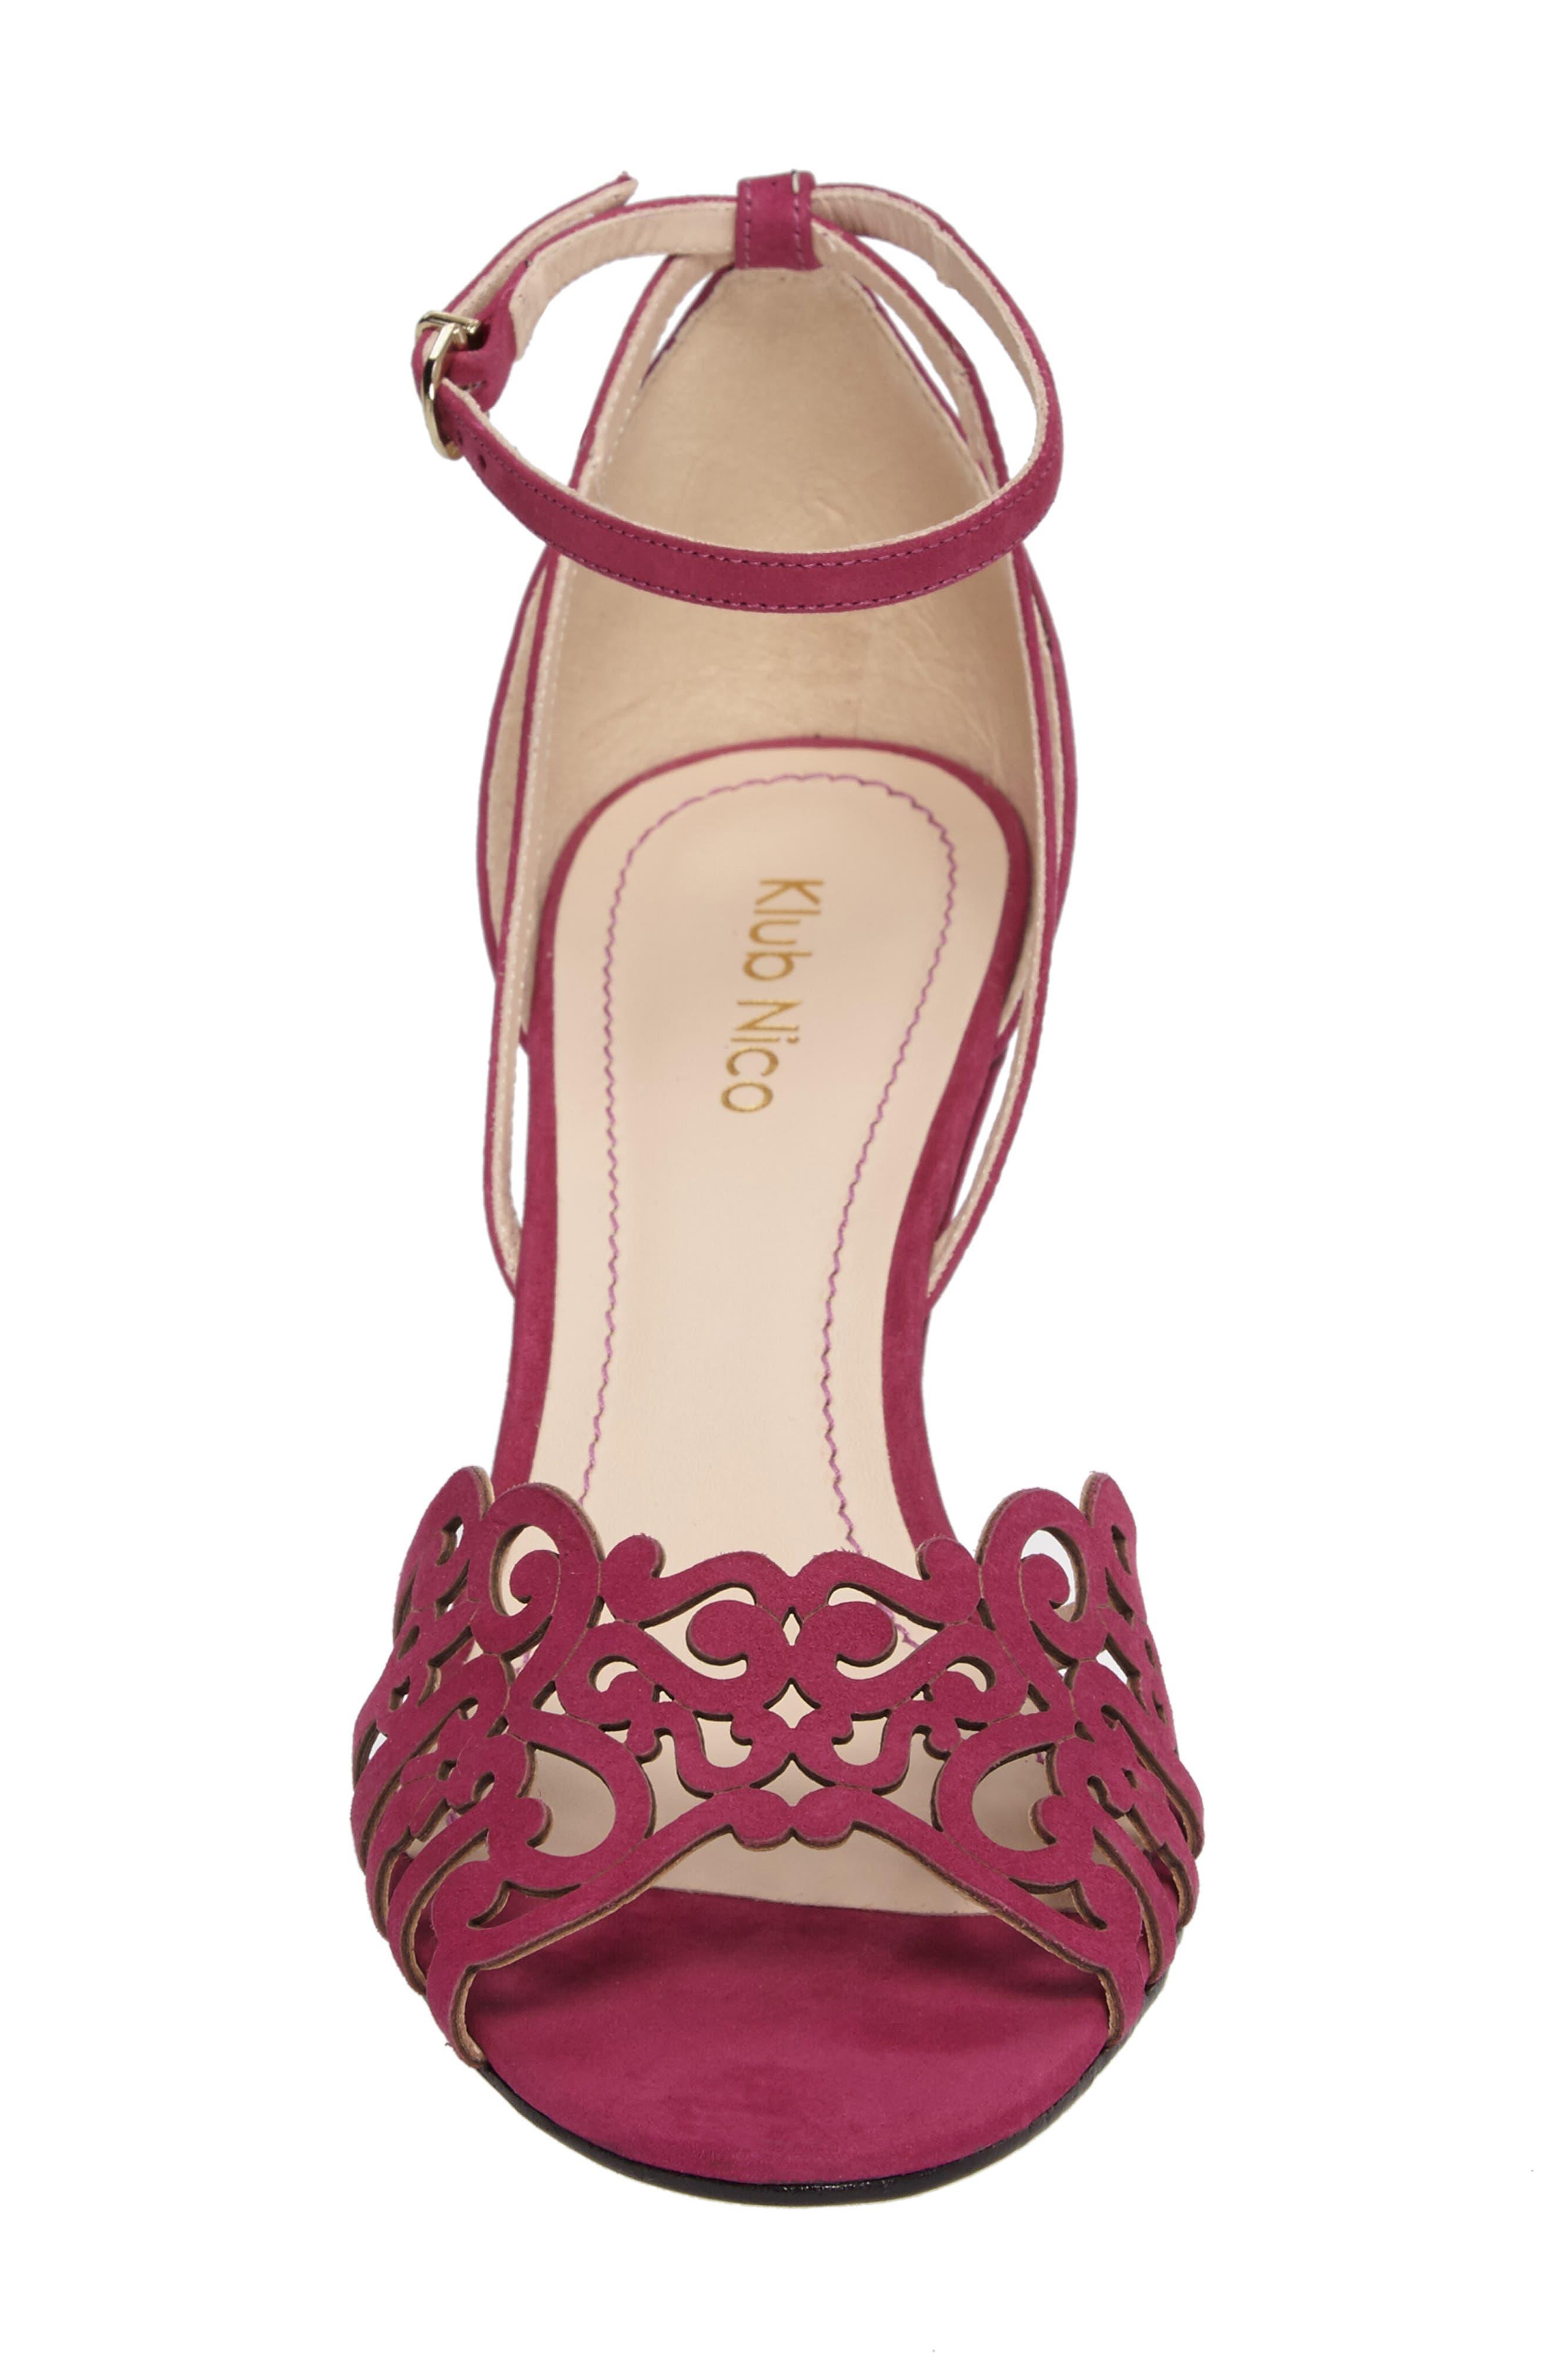 'Kingston' Ankle Strap Wedge Sandal,                             Alternate thumbnail 4, color,                             MAGENTA LEATHER